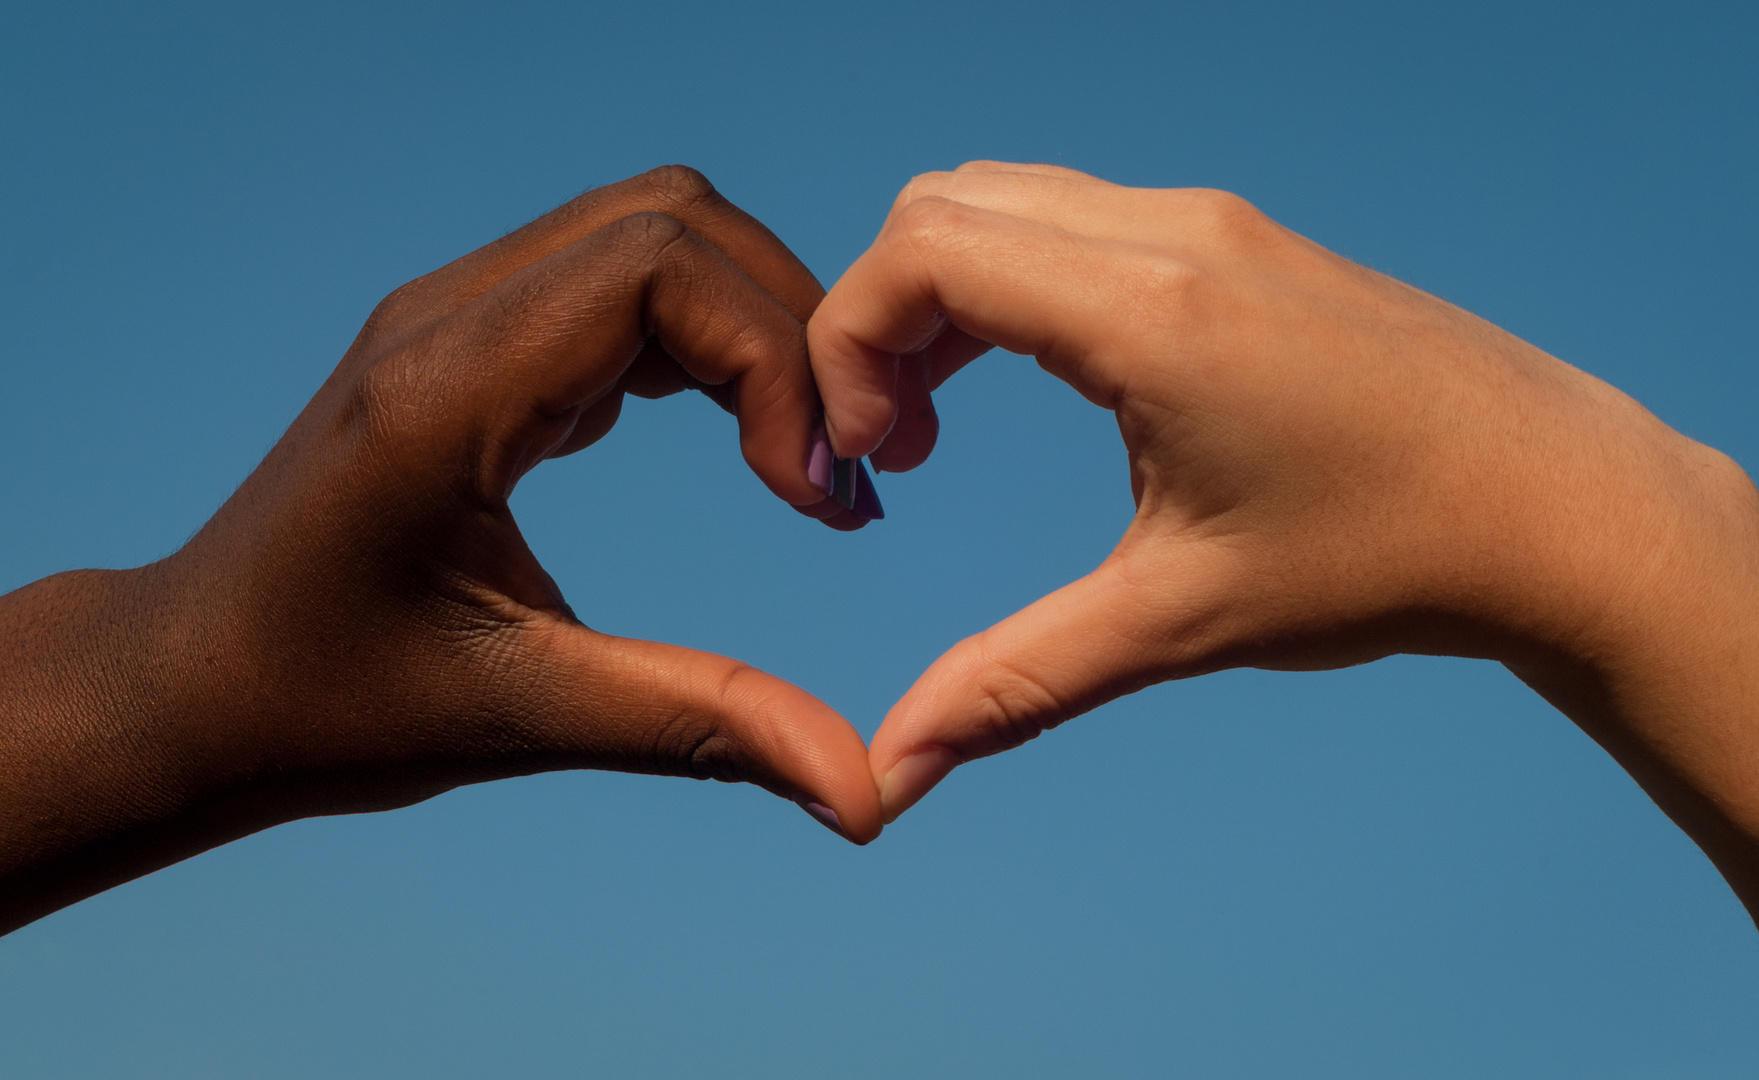 essay bridging america s racial divide  essay bridging america s racial divide